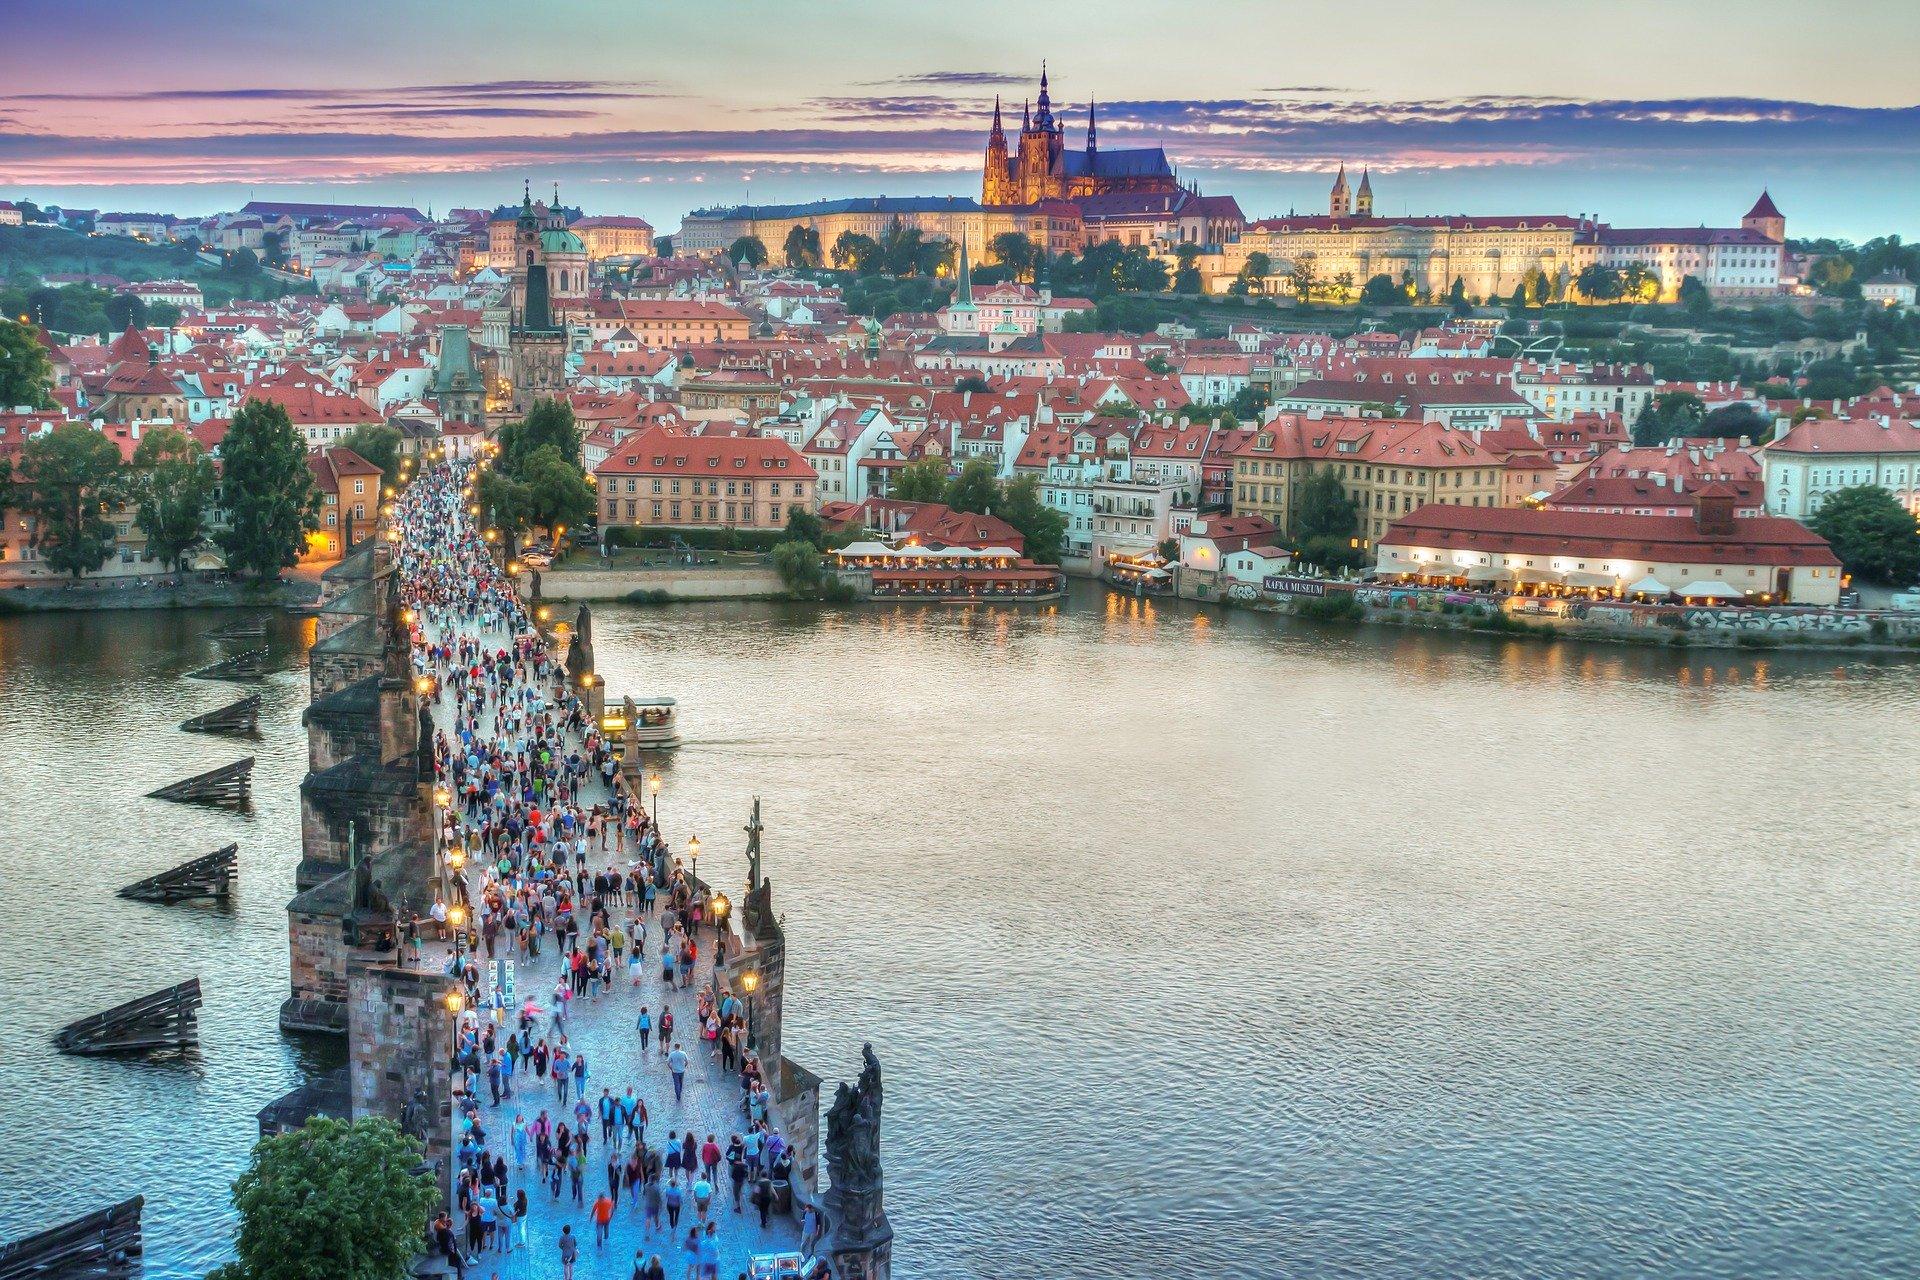 Vienna, Bohemia & the Treasures of the Danube